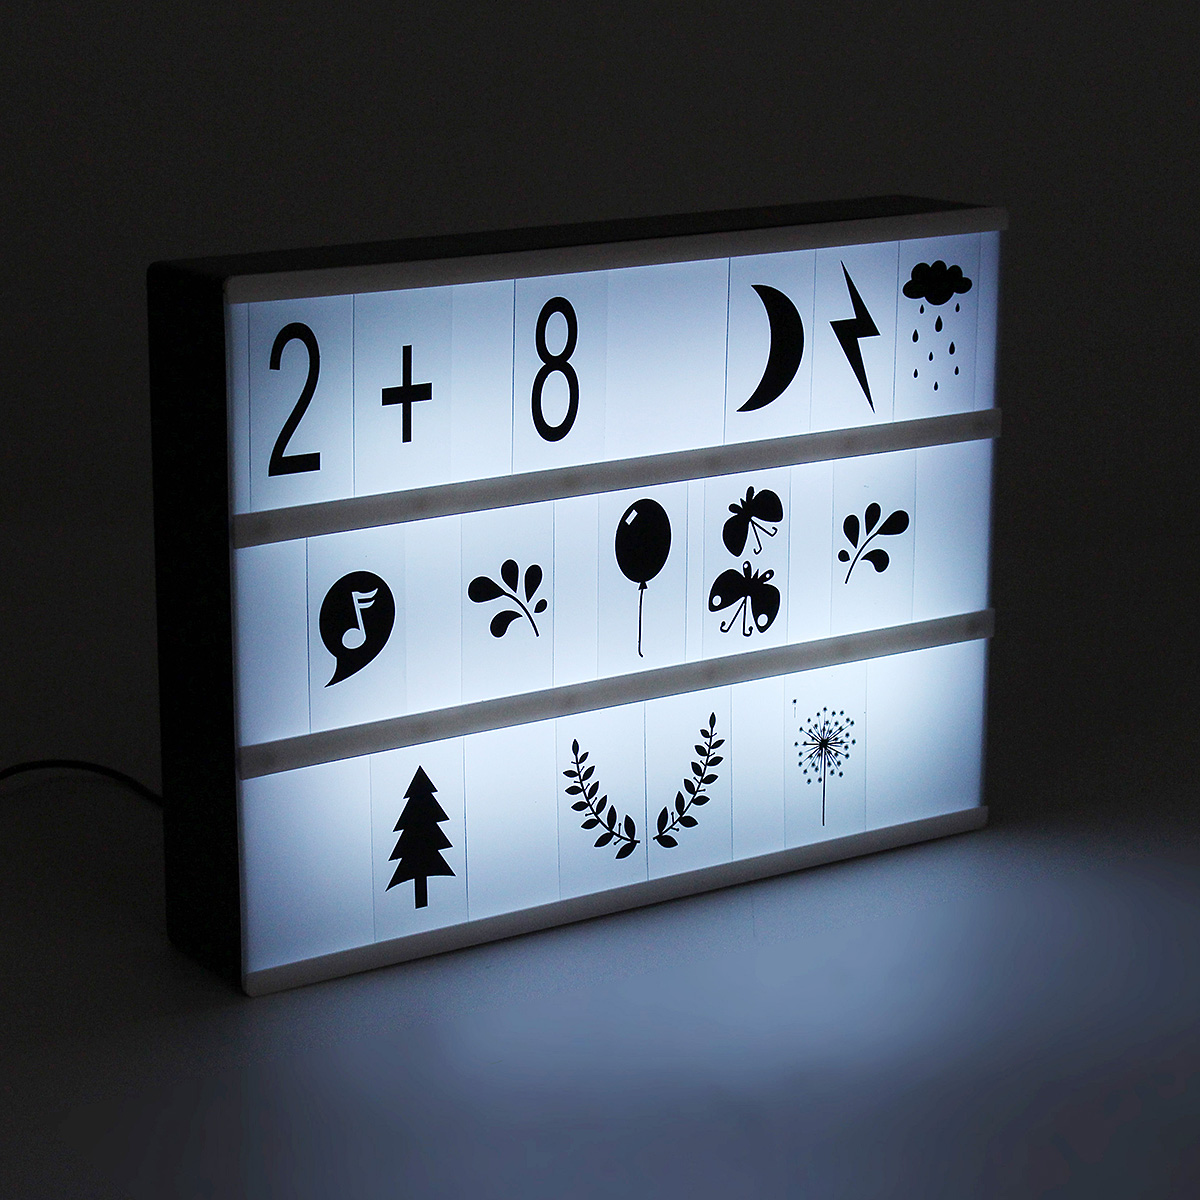 enseigne lumineuse deco maison top chiffre lumineux led uuuu rouge with enseigne lumineuse deco. Black Bedroom Furniture Sets. Home Design Ideas